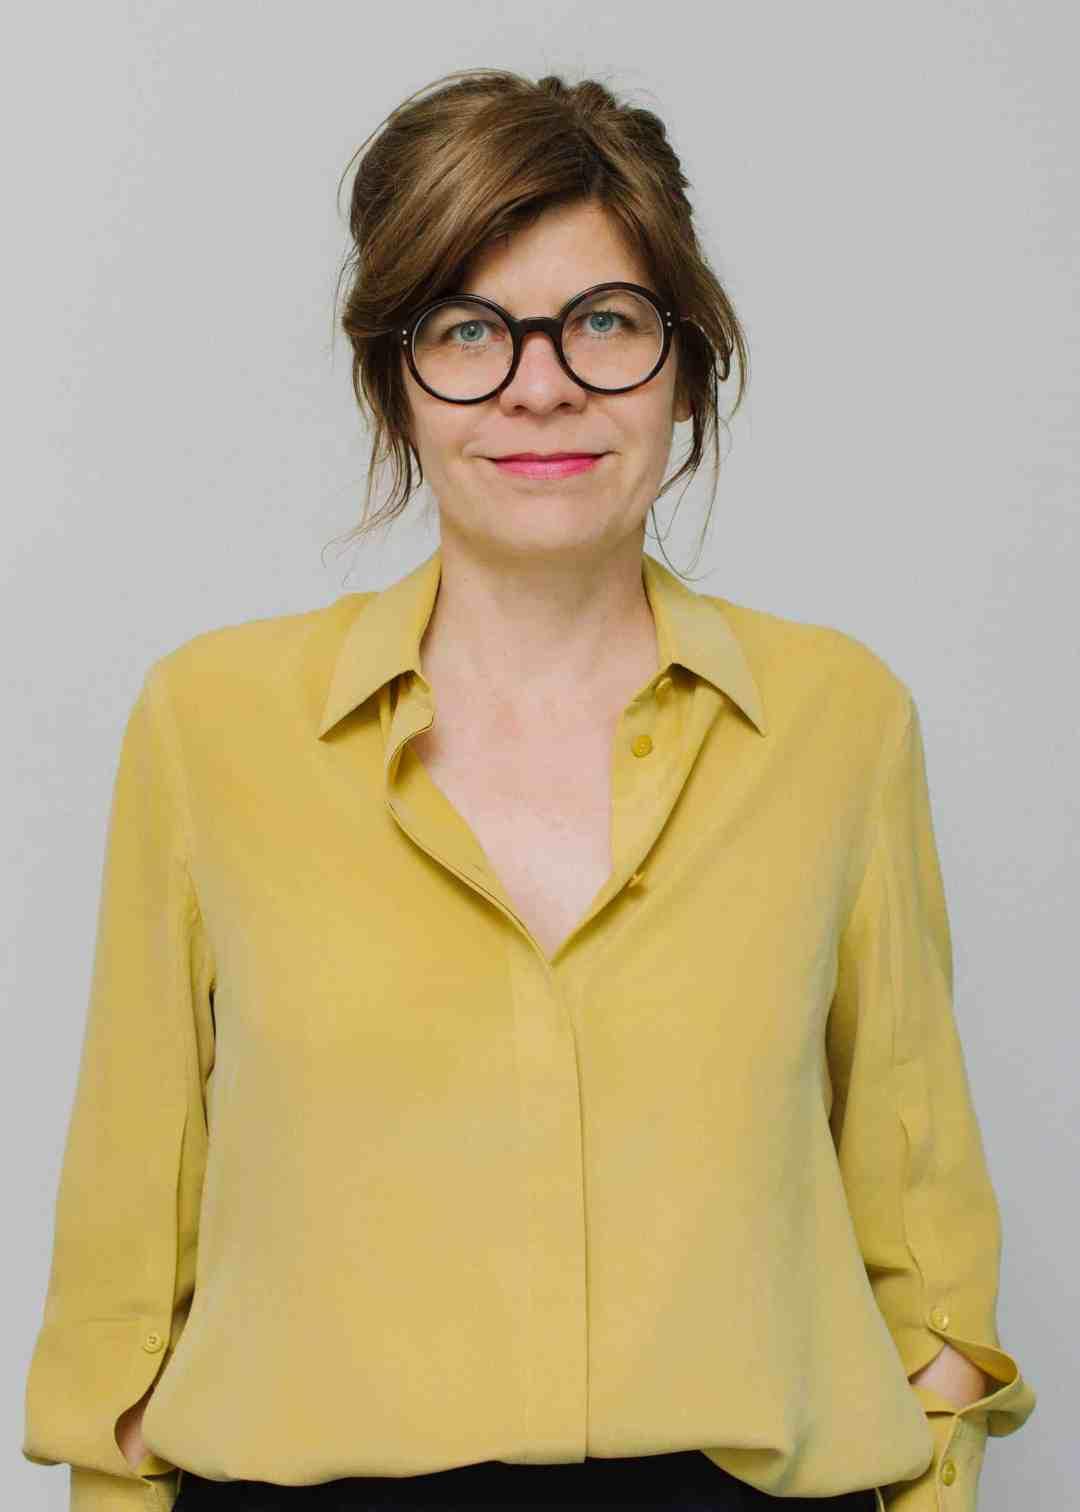 Joanna Kamm, photo: Diana Pfammatter